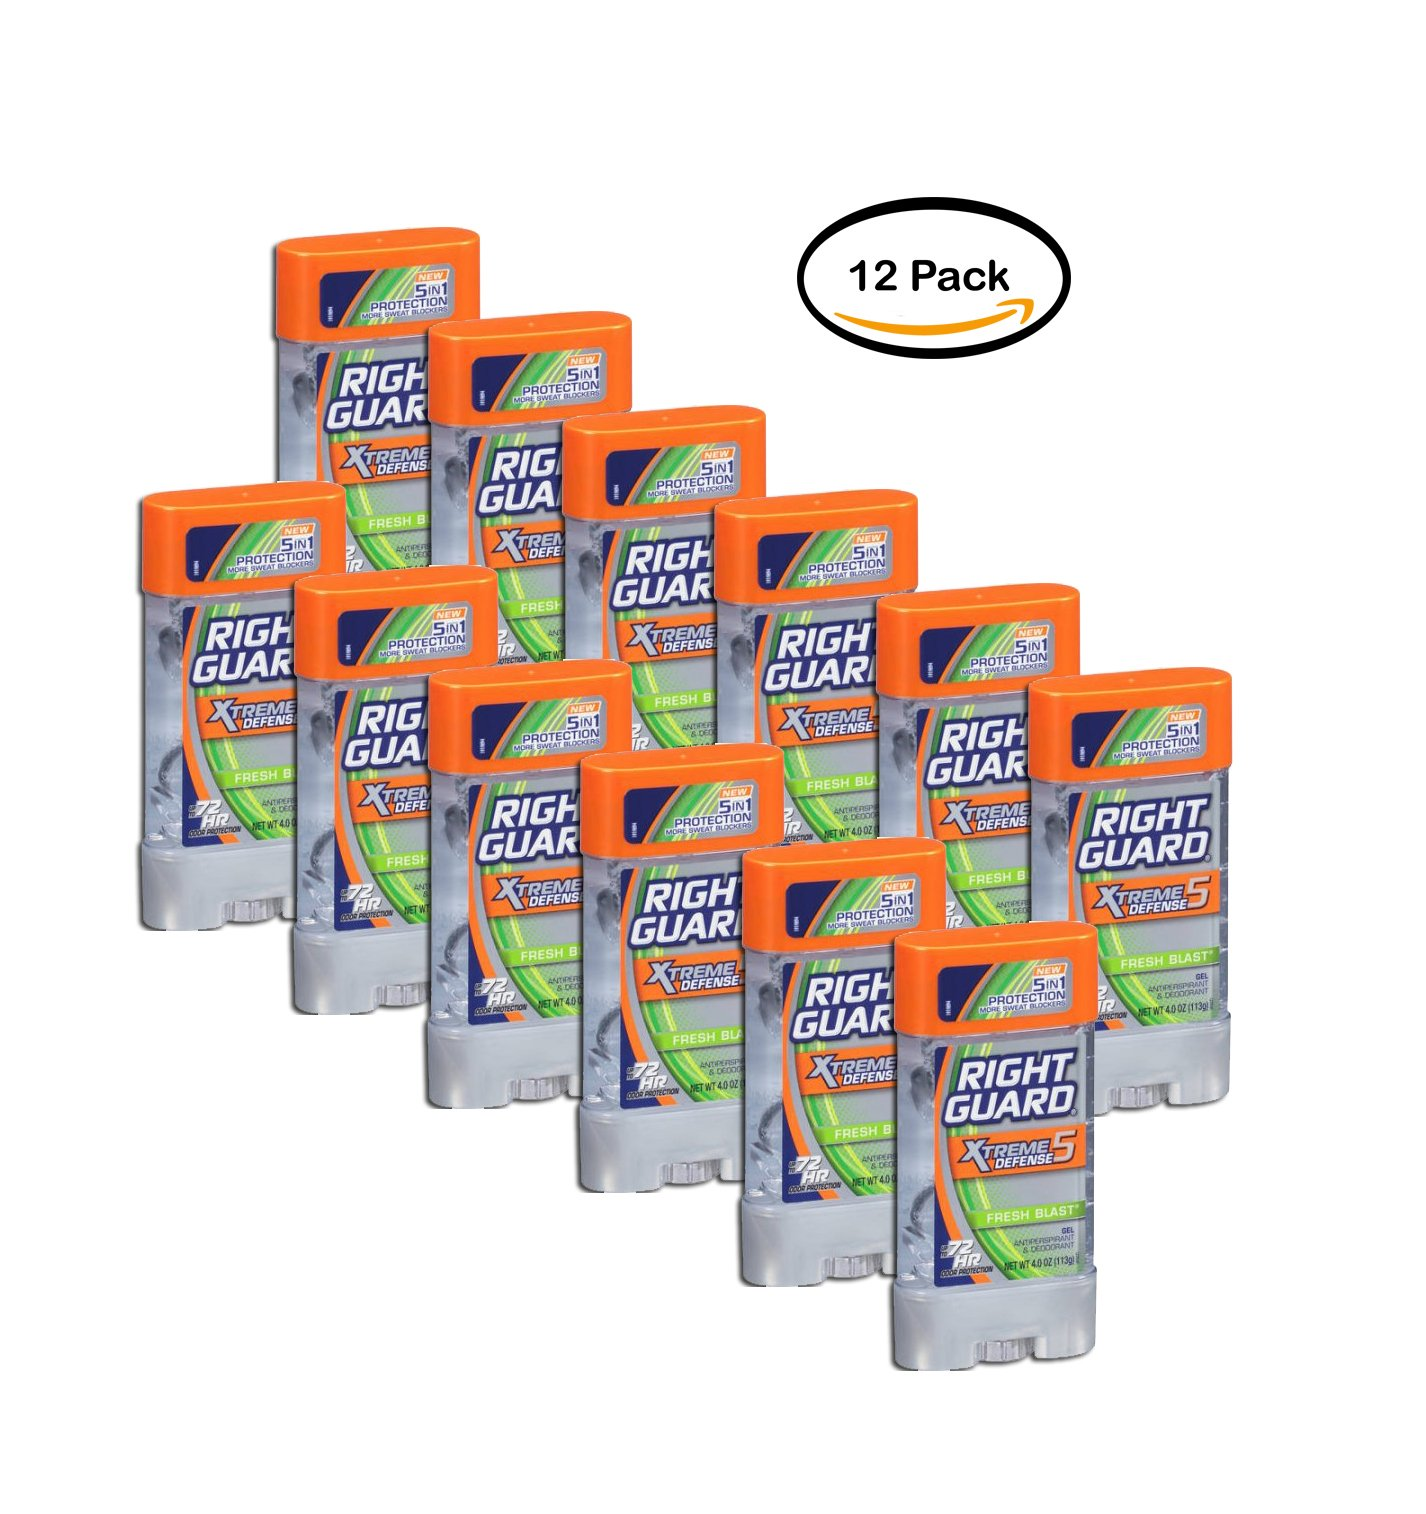 PACK OF 12 - Right Guard Xtreme Defense 5 Antiperspirant Deodorant Gel, Fresh Blast, 4 Oz